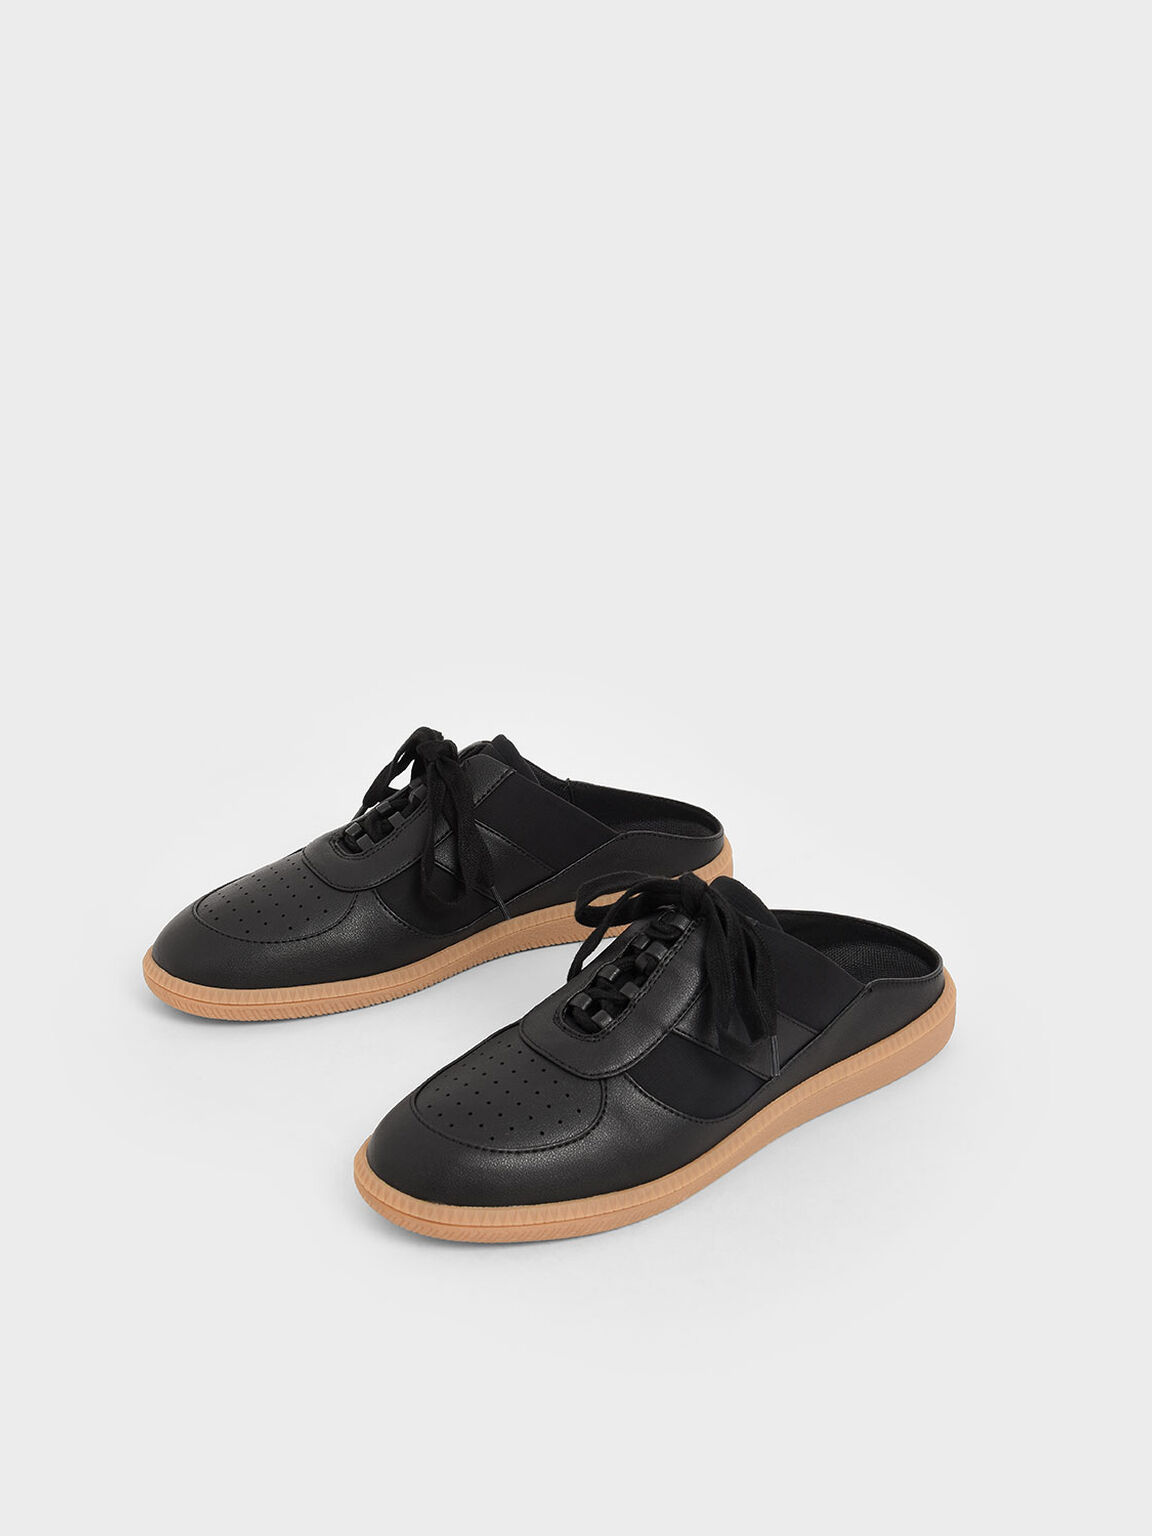 Lace Up Sneaker Mules, Black, hi-res